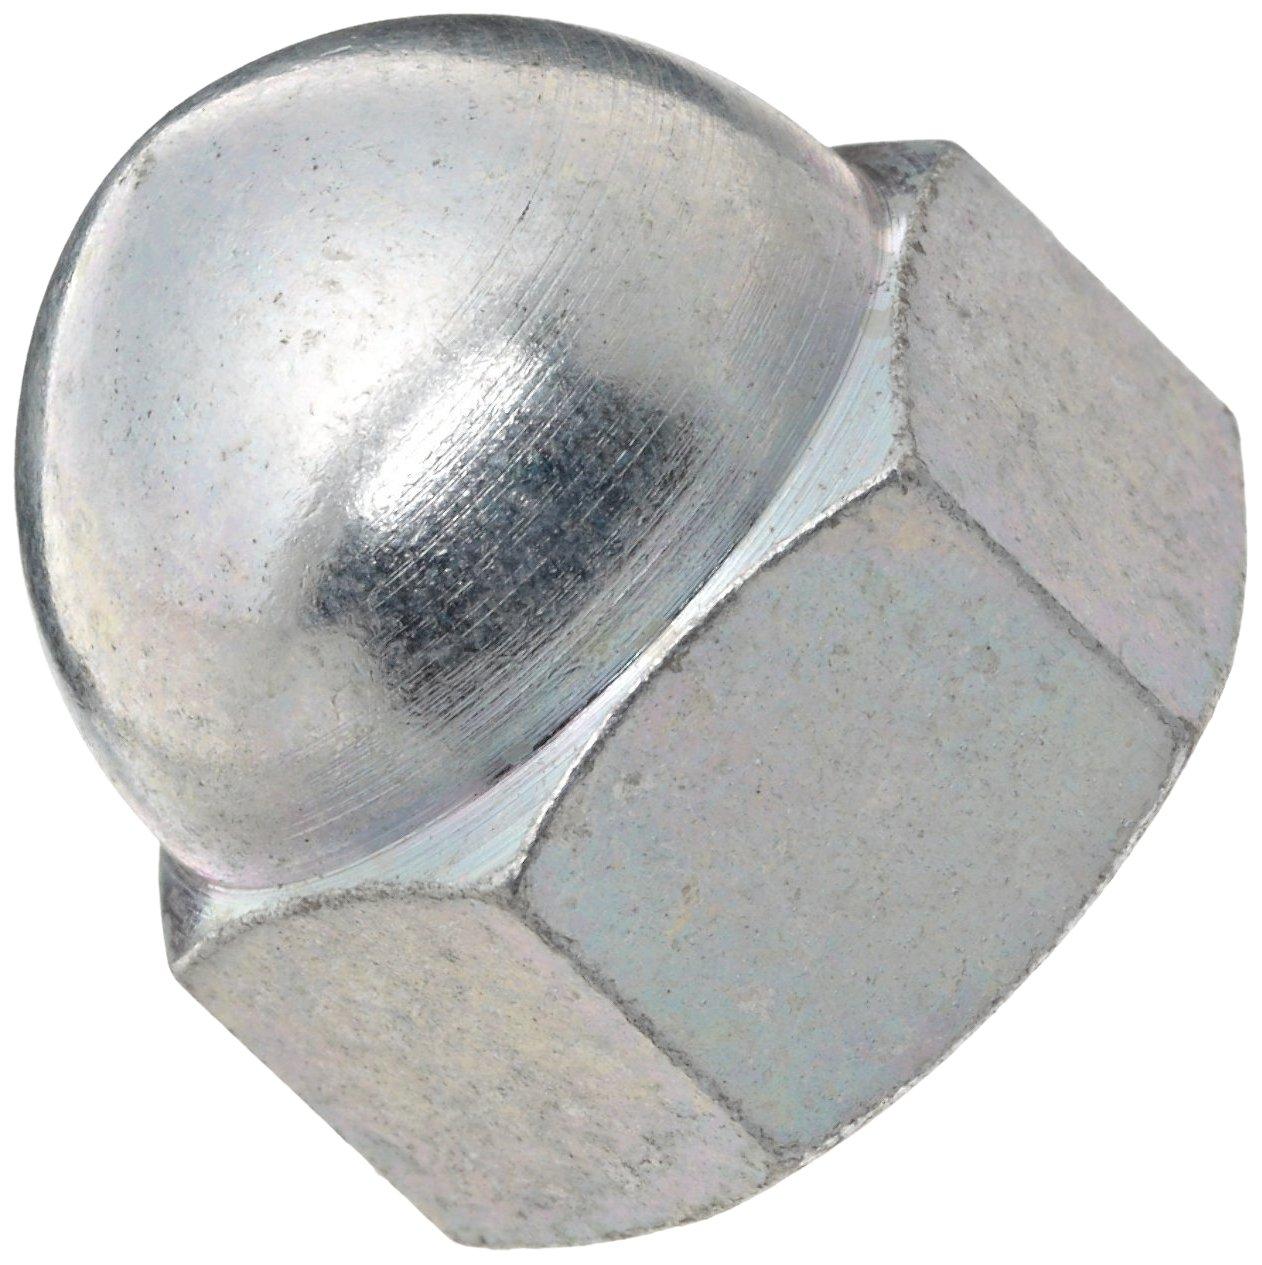 Zinc Plated Steel Acorn Nut, USA Made, 7/16'-14 Thread Size, 5/8' Width Across Flats, 11/16' Height, 7/16' Minimum Thread Depth (Pack of 20) 7/16-14 Thread Size 5/8 Width Across Flats 11/16 Height 7/16 Minimum Thread Depth (Pack of 20) Small Parts